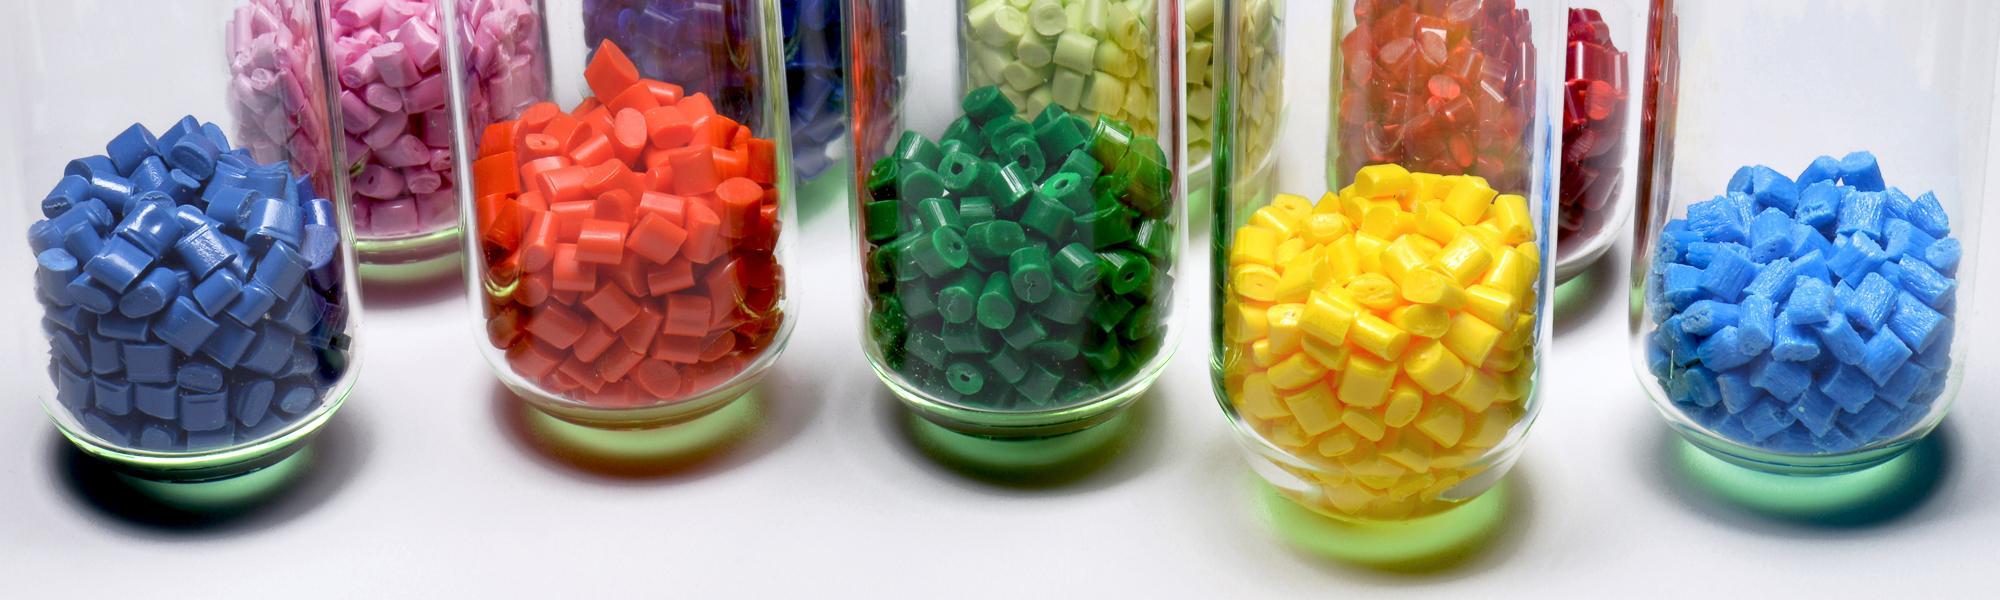 Forschung Entwicklung Kunststoff.jpg